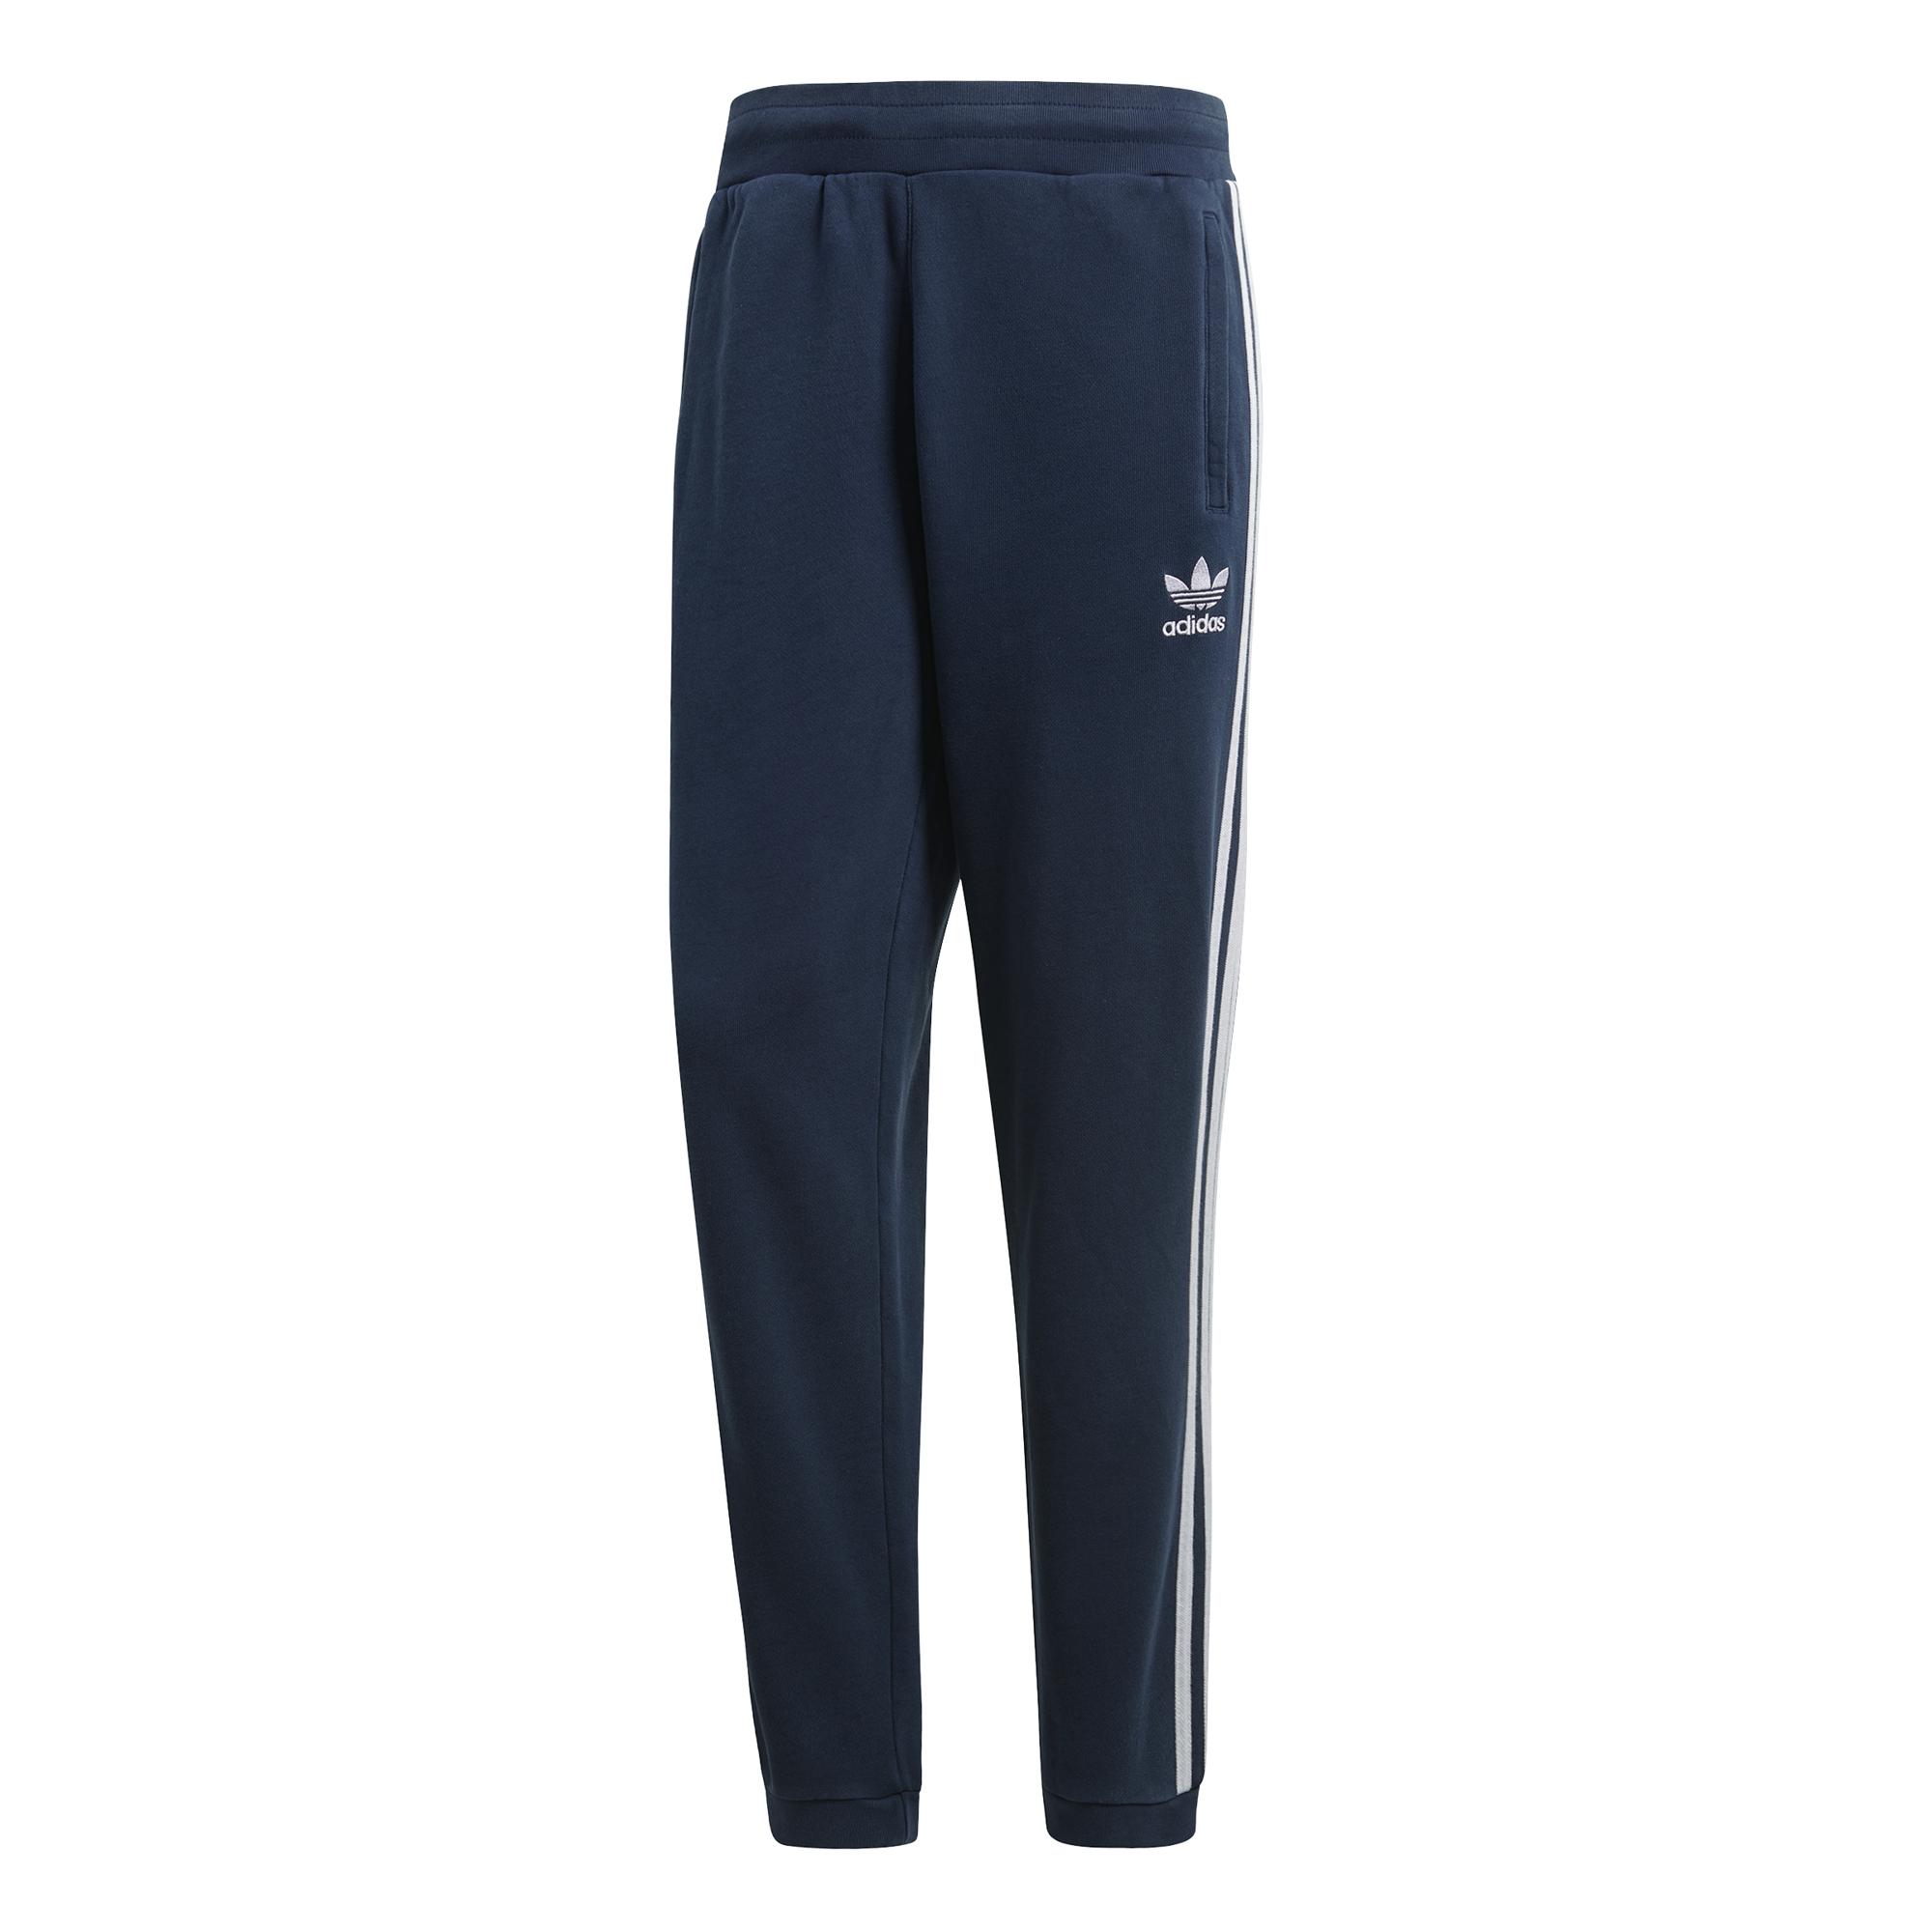 spodnie adidas 3 Stripes Pants DJ2118